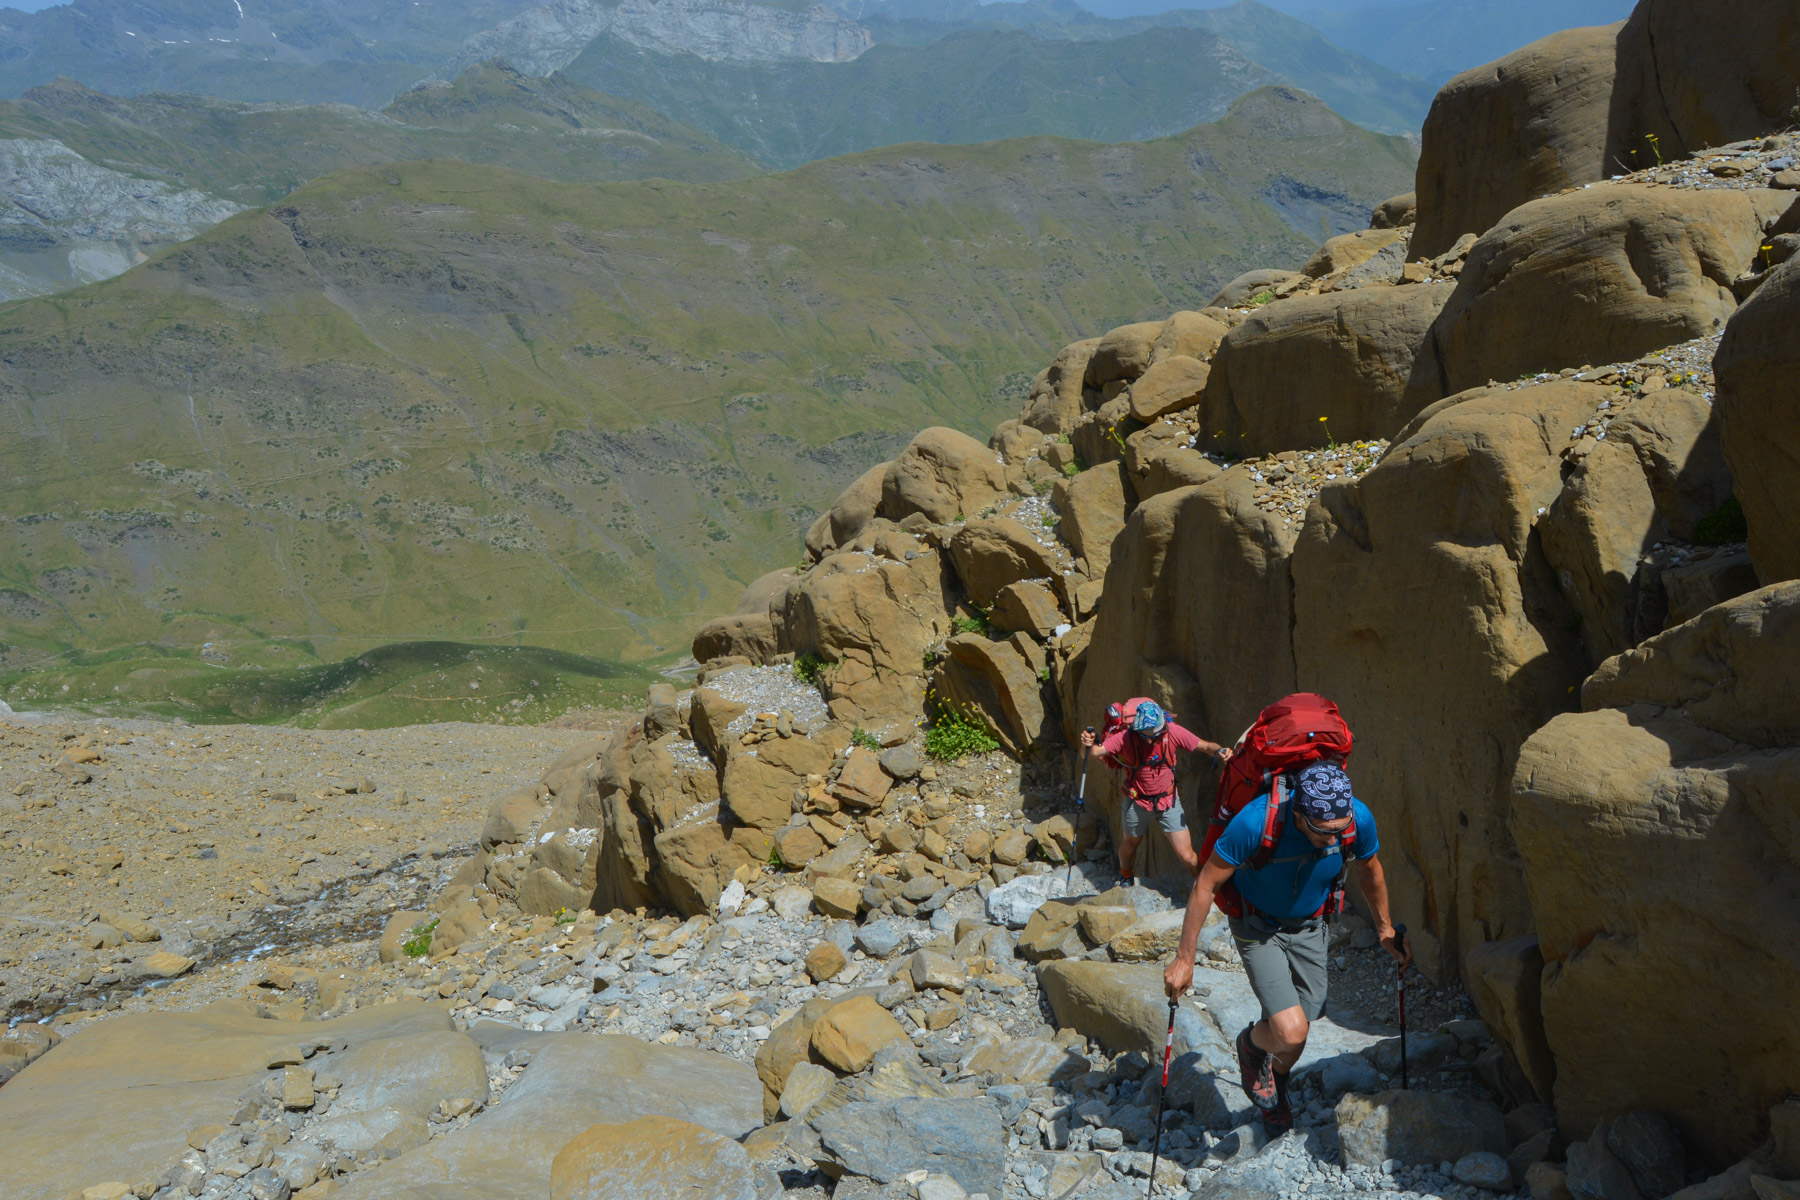 Monte Perdido et Faja de las Flores, Jour 1, Ordesa, Aragon, Espagne 11